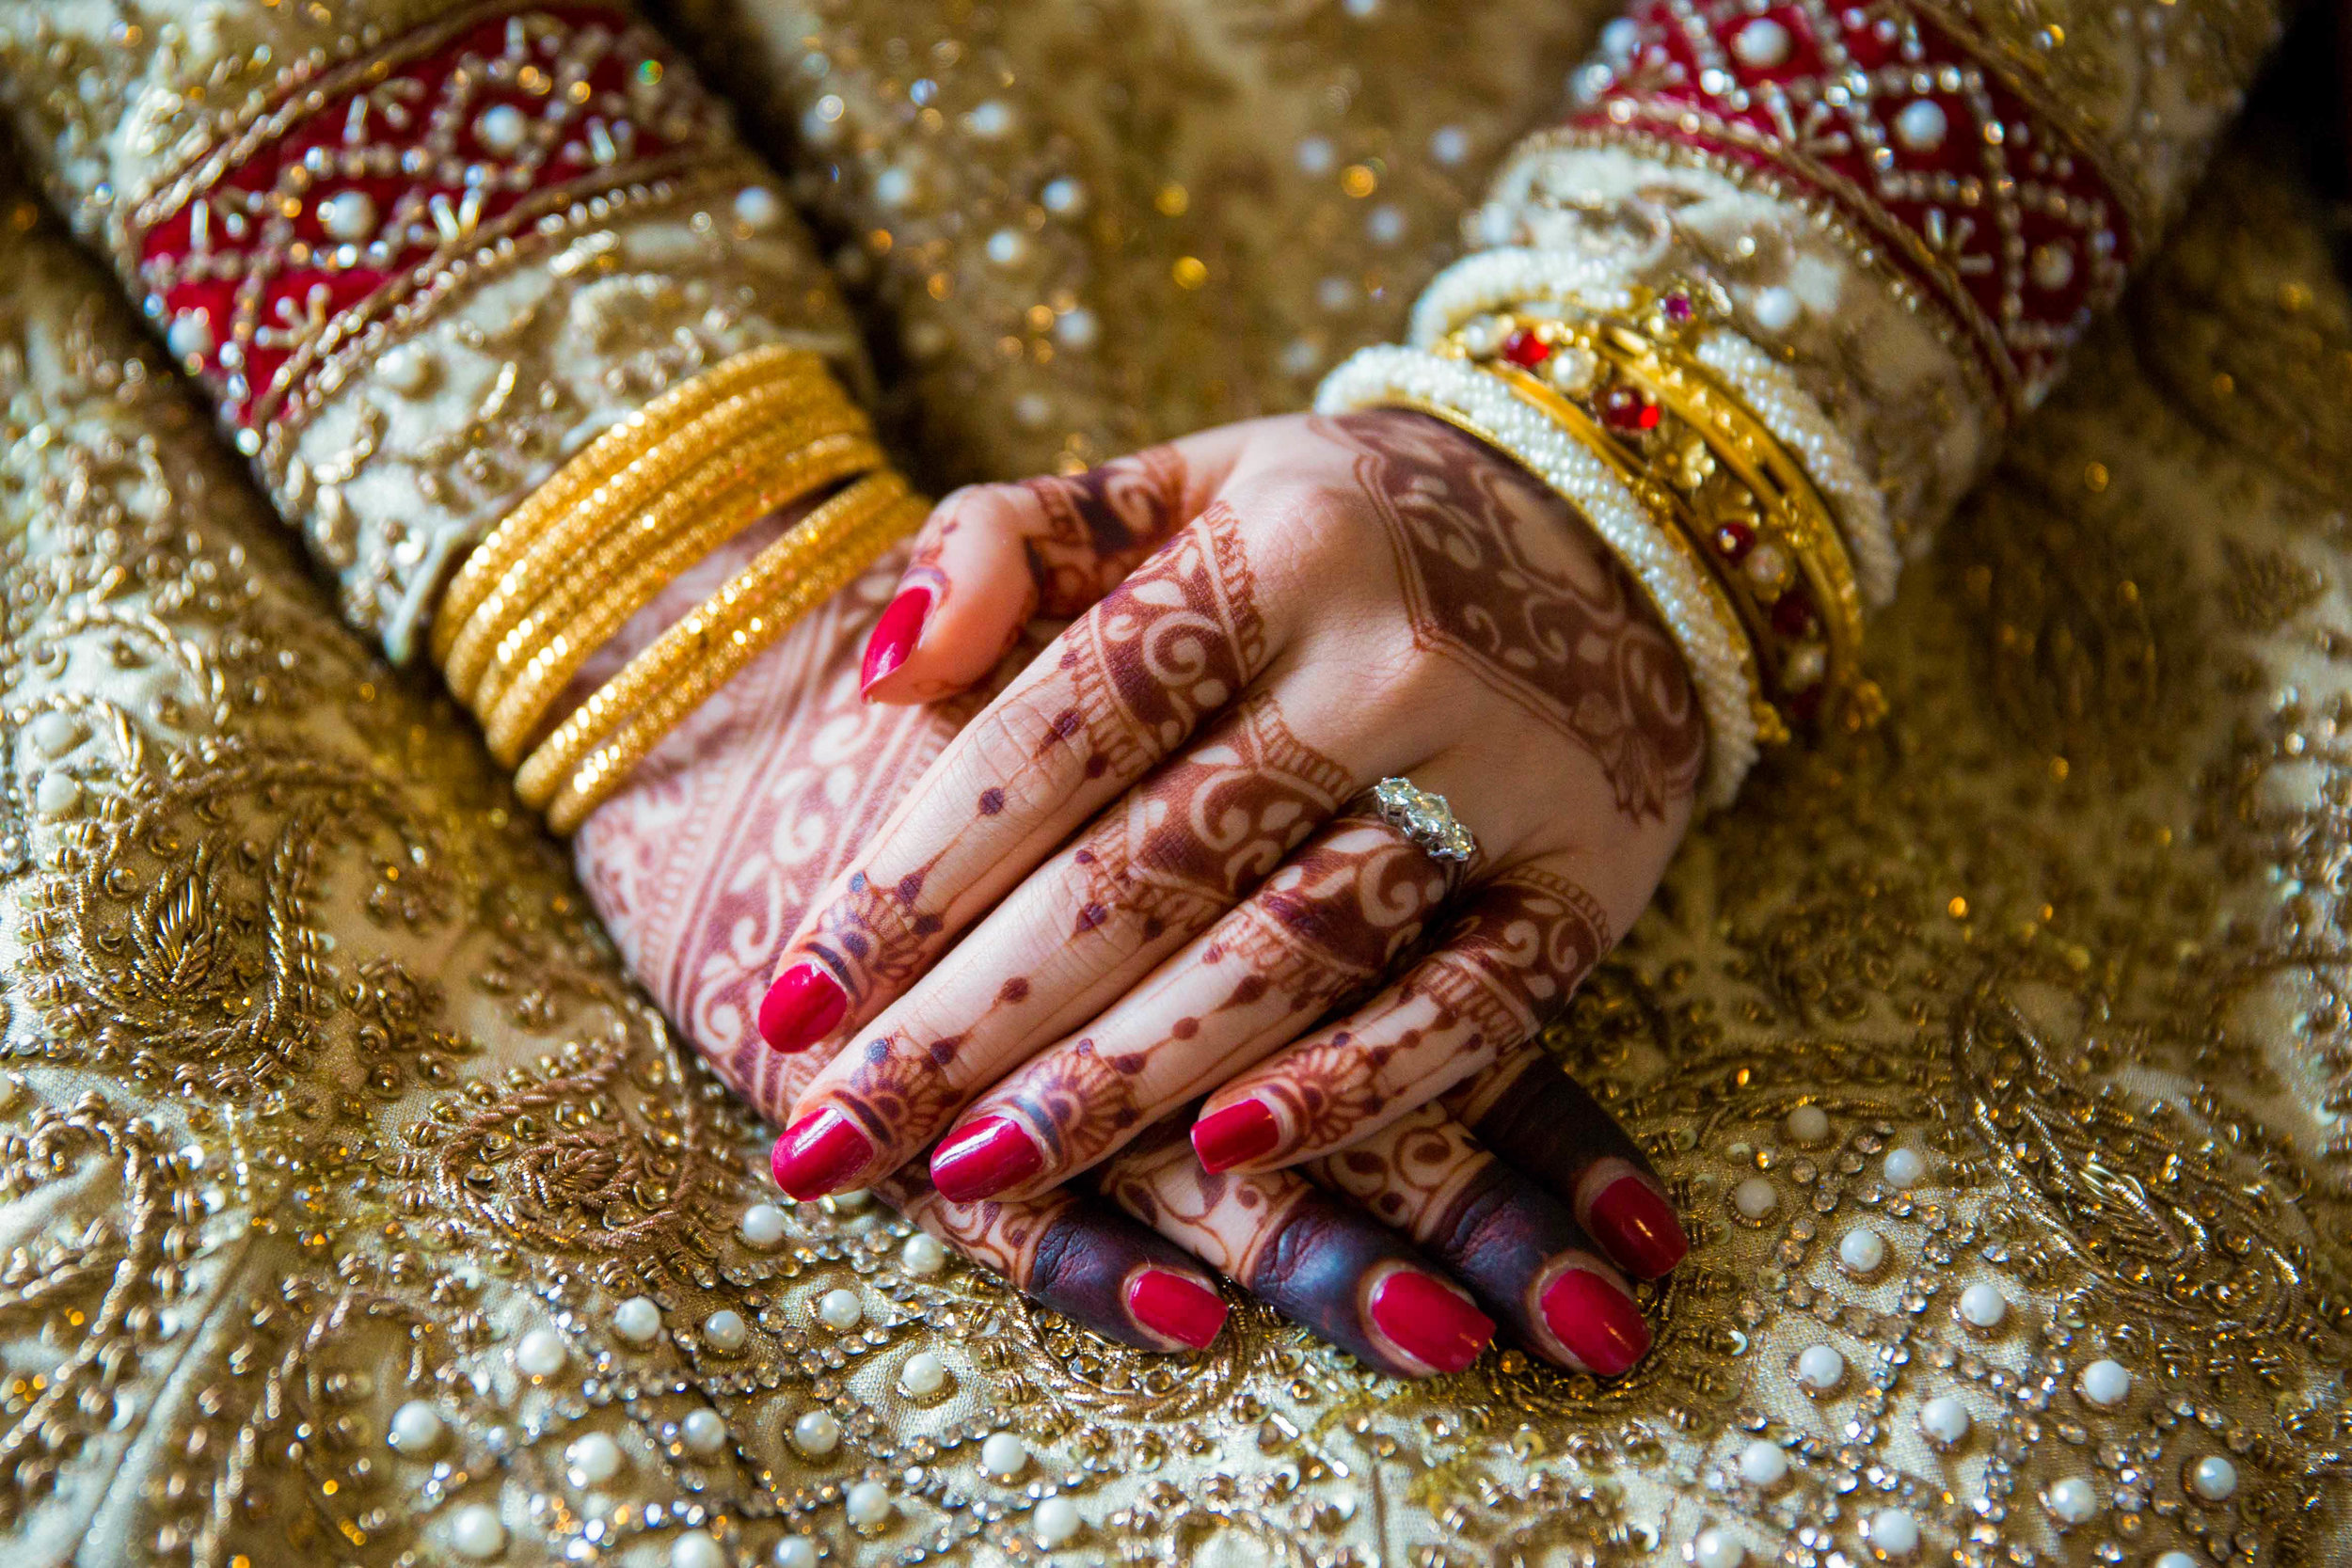 Macdonald-Berystede-Hotel-wedding-female-asian-wedding-photographer-london-natalia-smith-photography-3-3.jpg